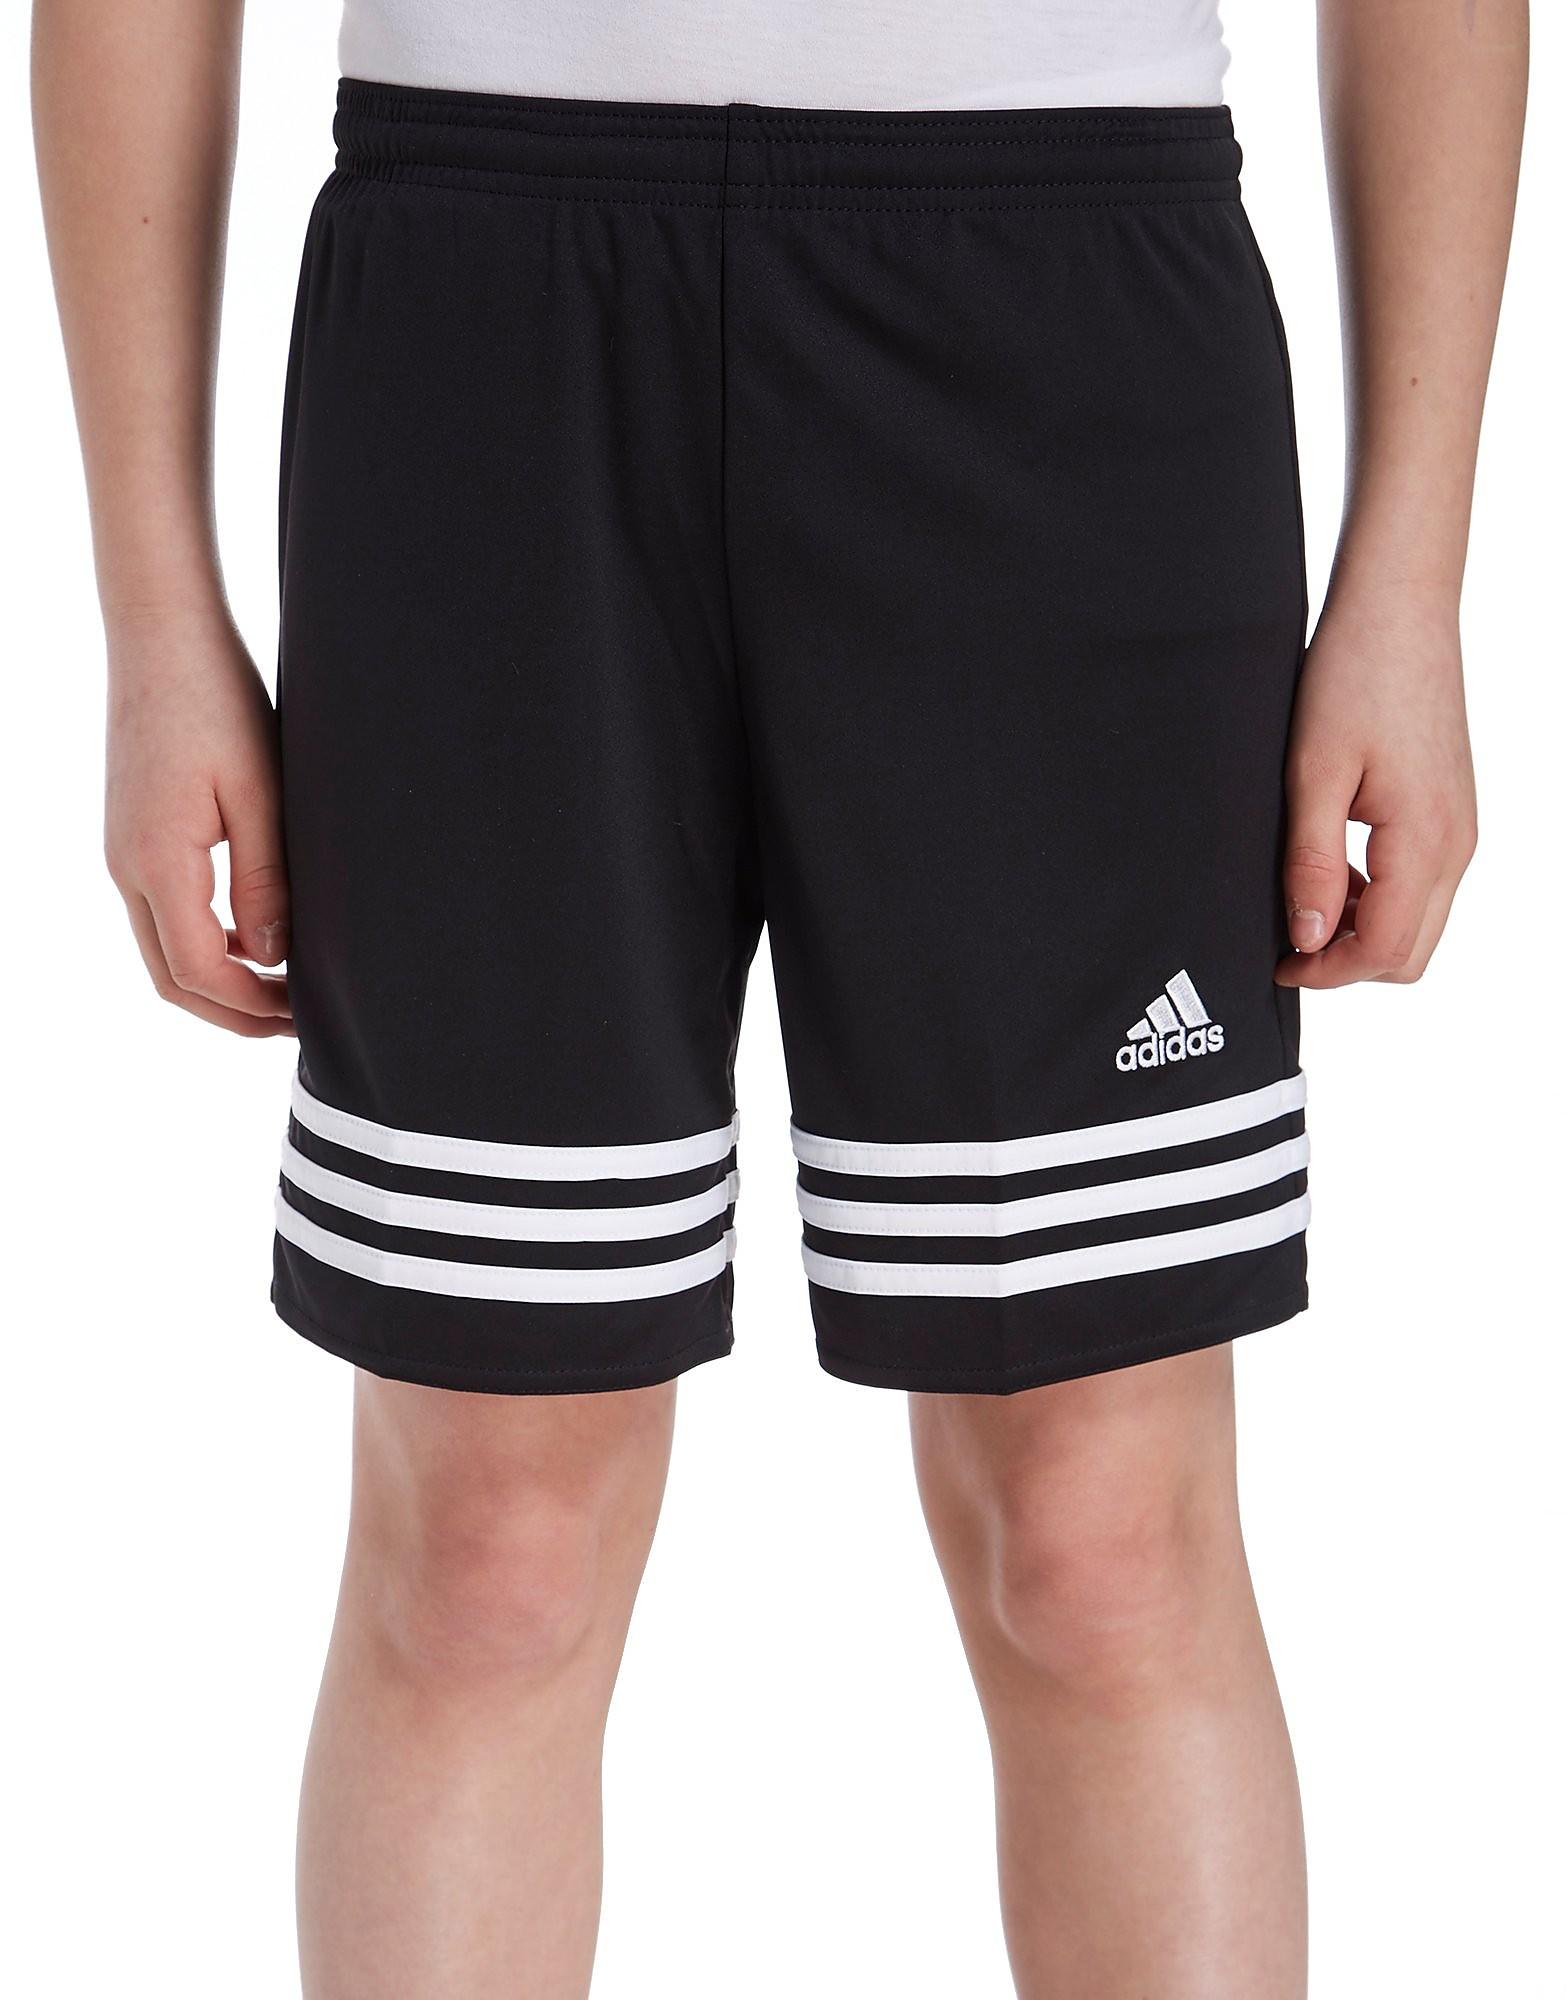 adidas Entrada Shorts til Juniorer